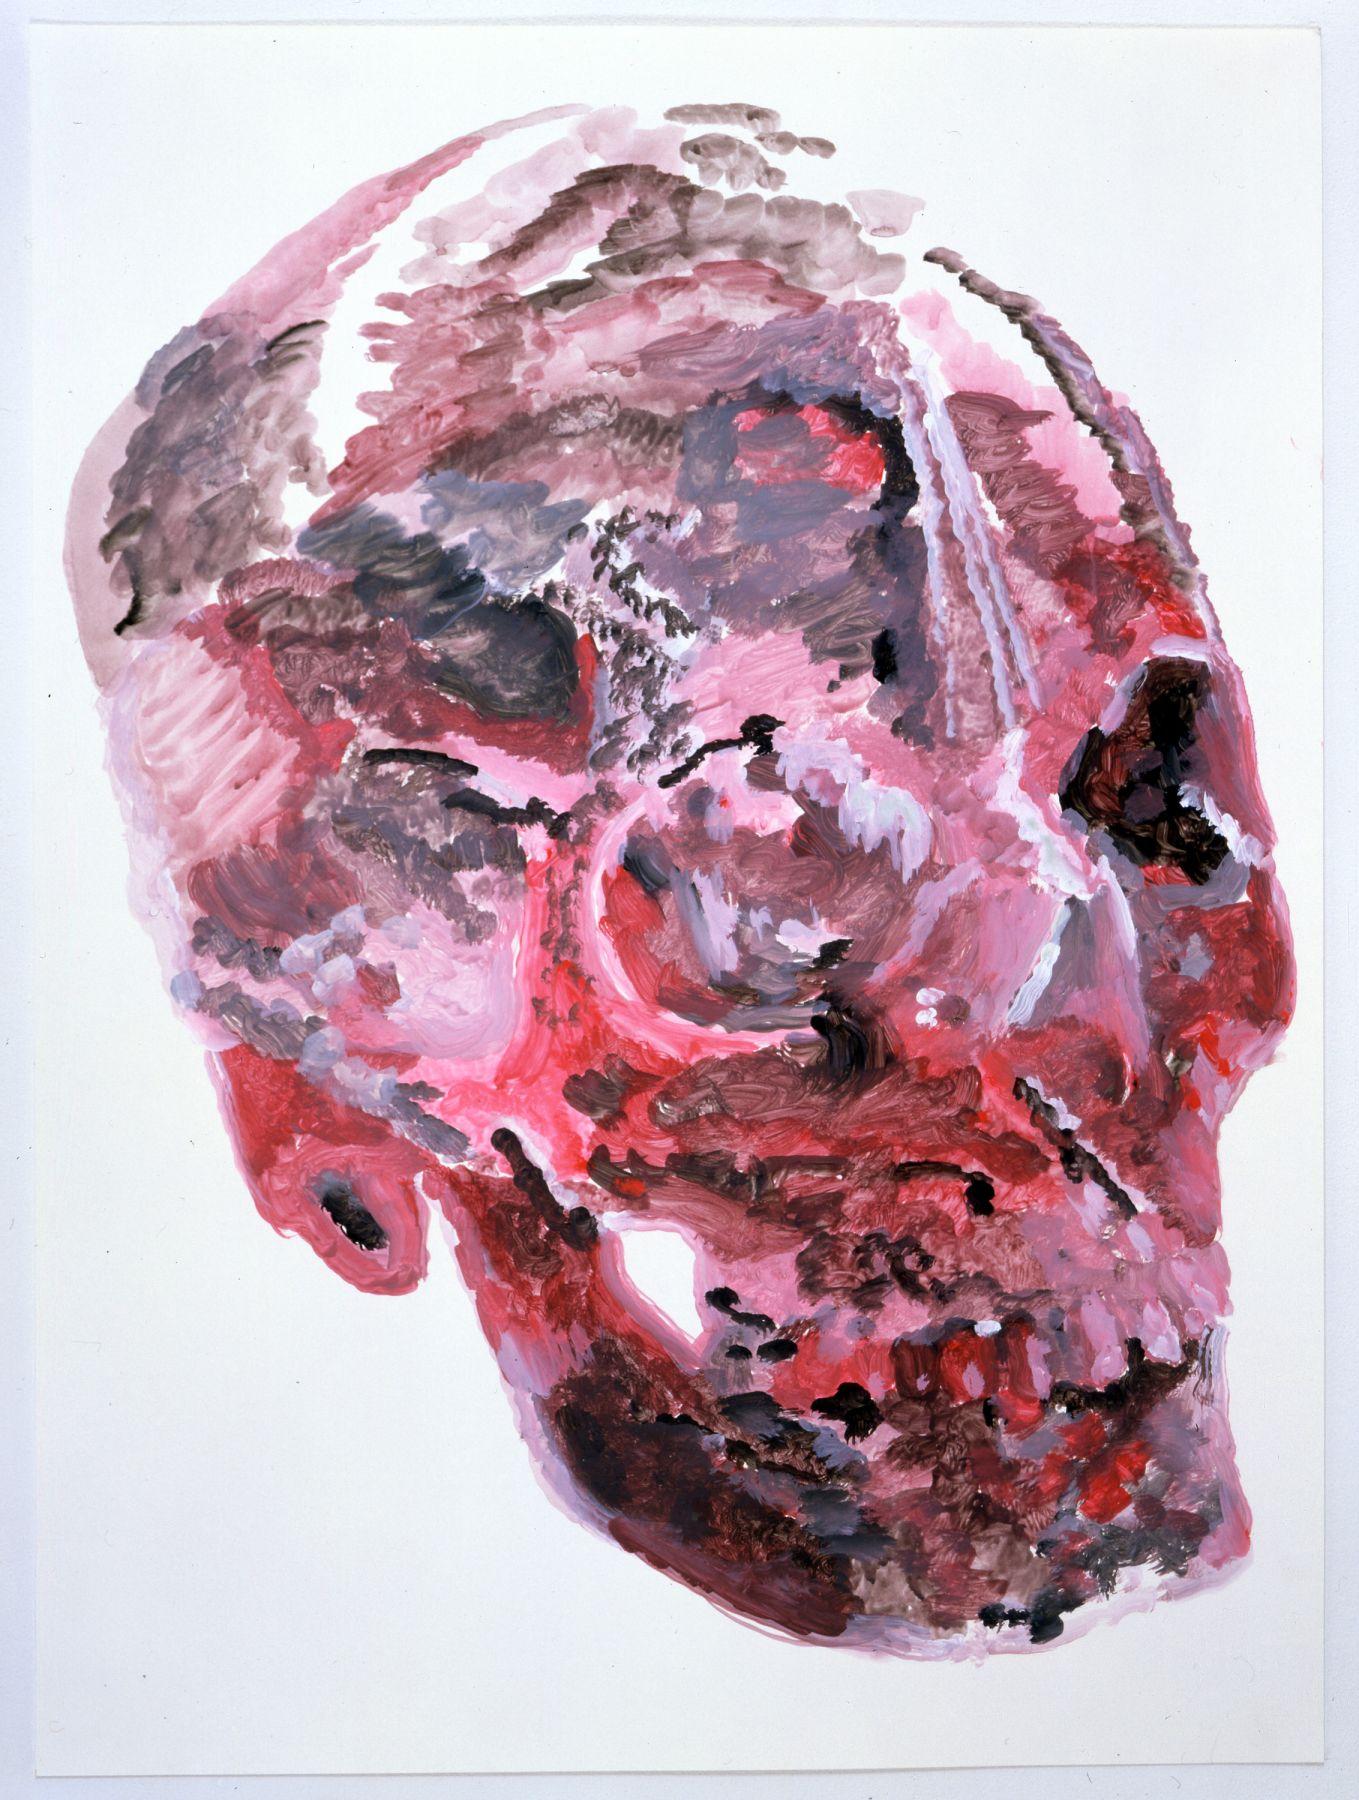 TONY OURSLER, Slang, 2000